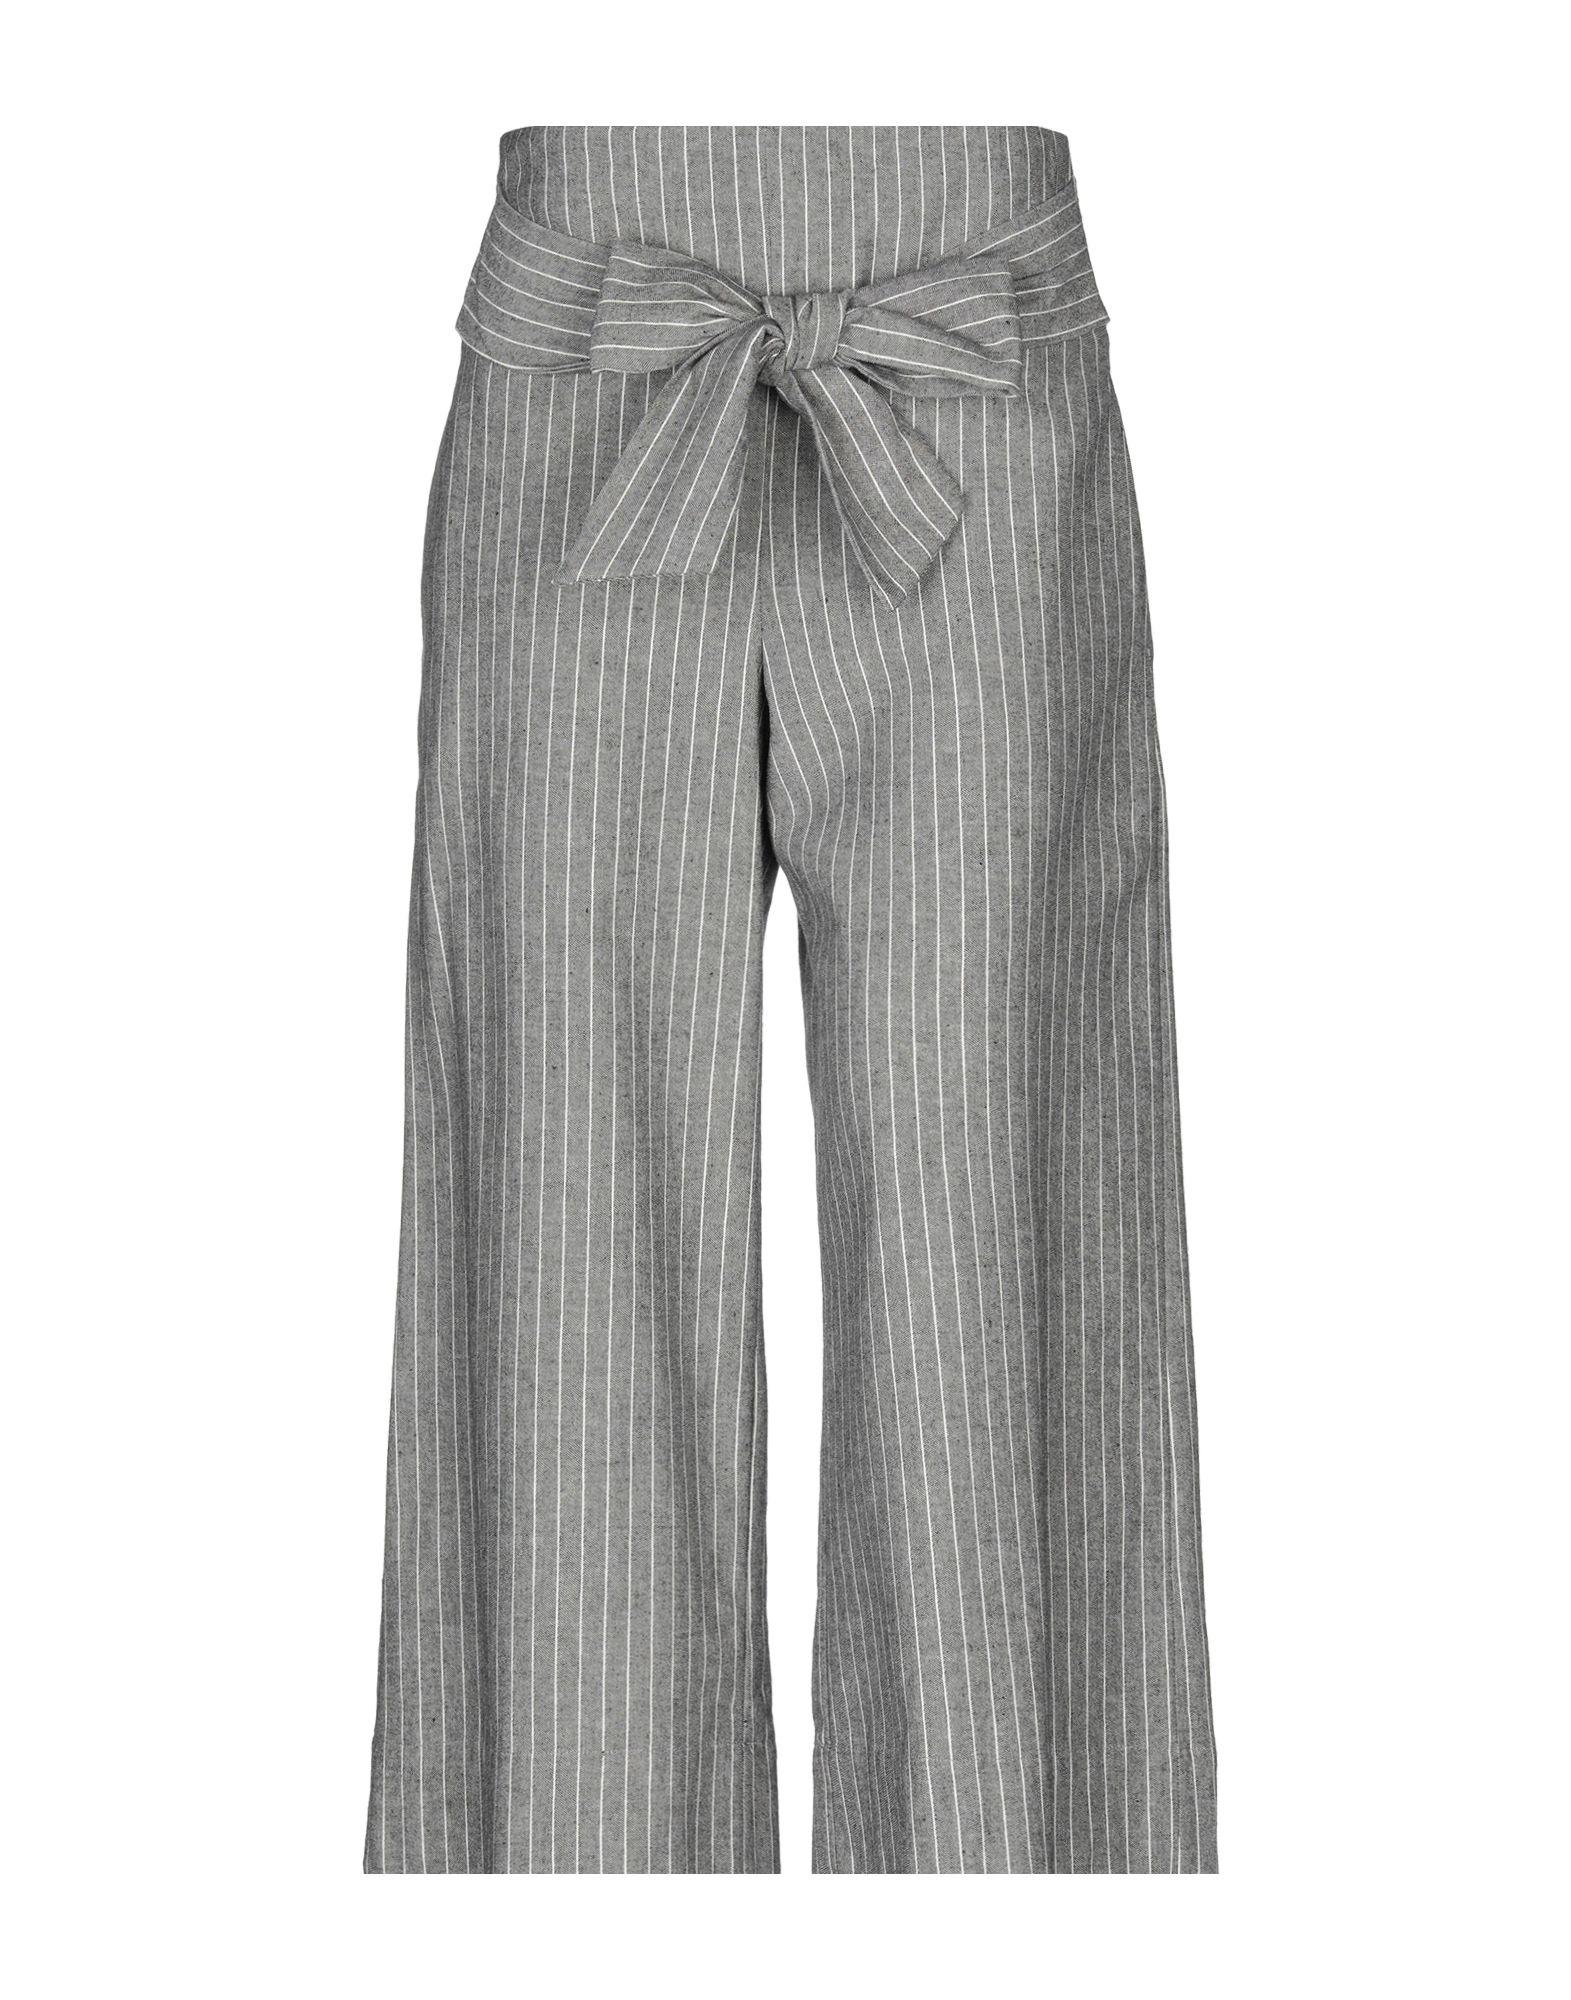 Pantalone Rue•8Isquit damen - 13265312IJ